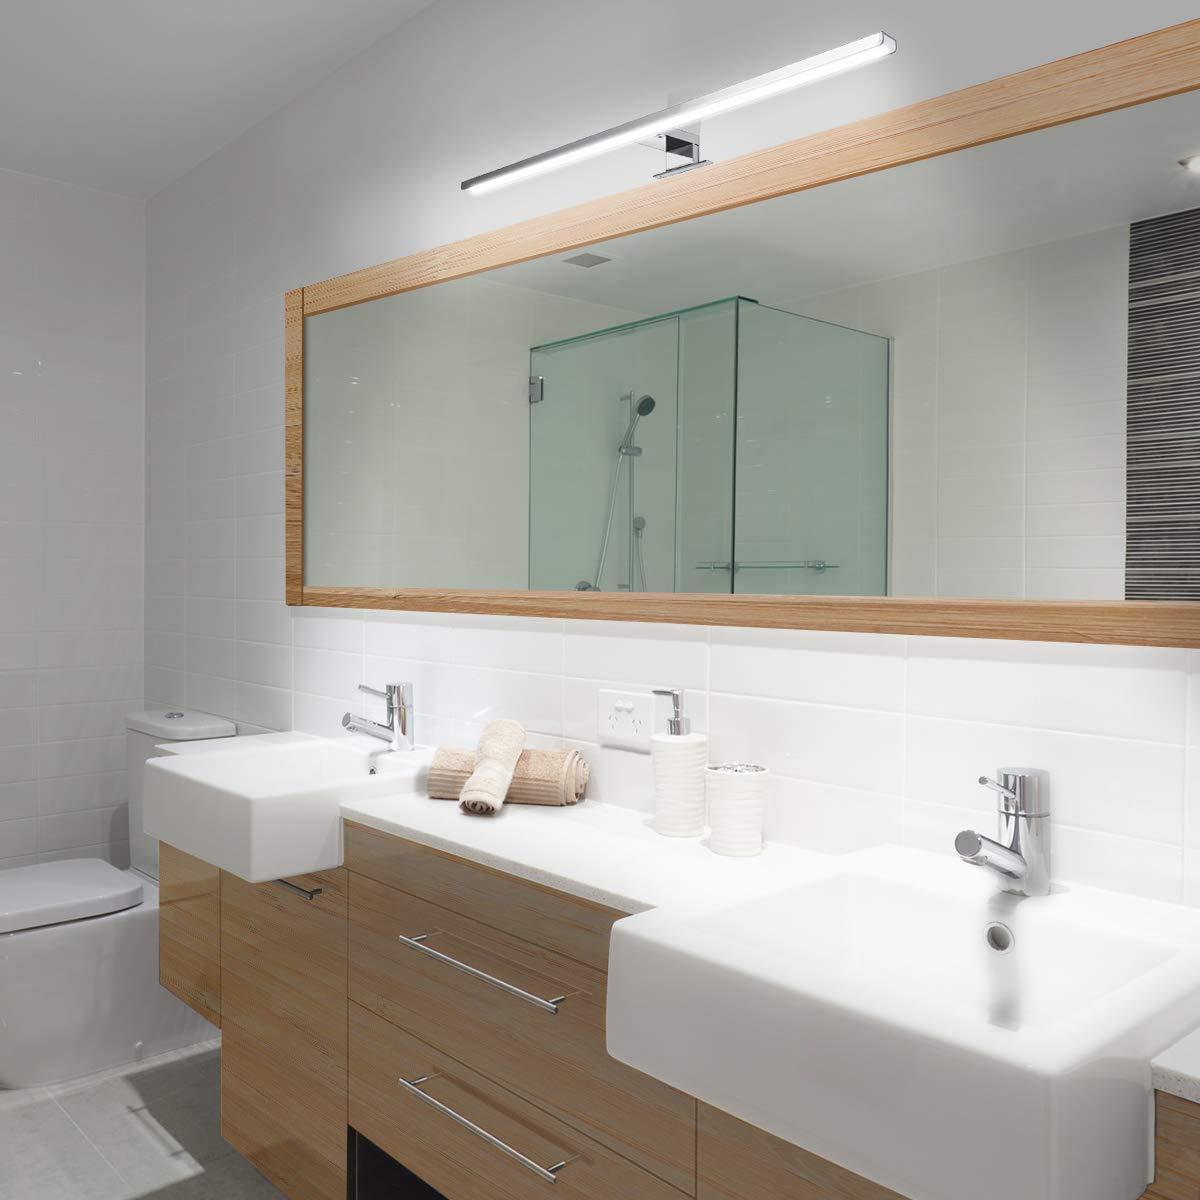 Indoor Led Wall Light Mirror Wall Lamp 10W 800LM White 60cm Waterproof Aluminum Lighting Bathroom Restroom Mirror Makeup light